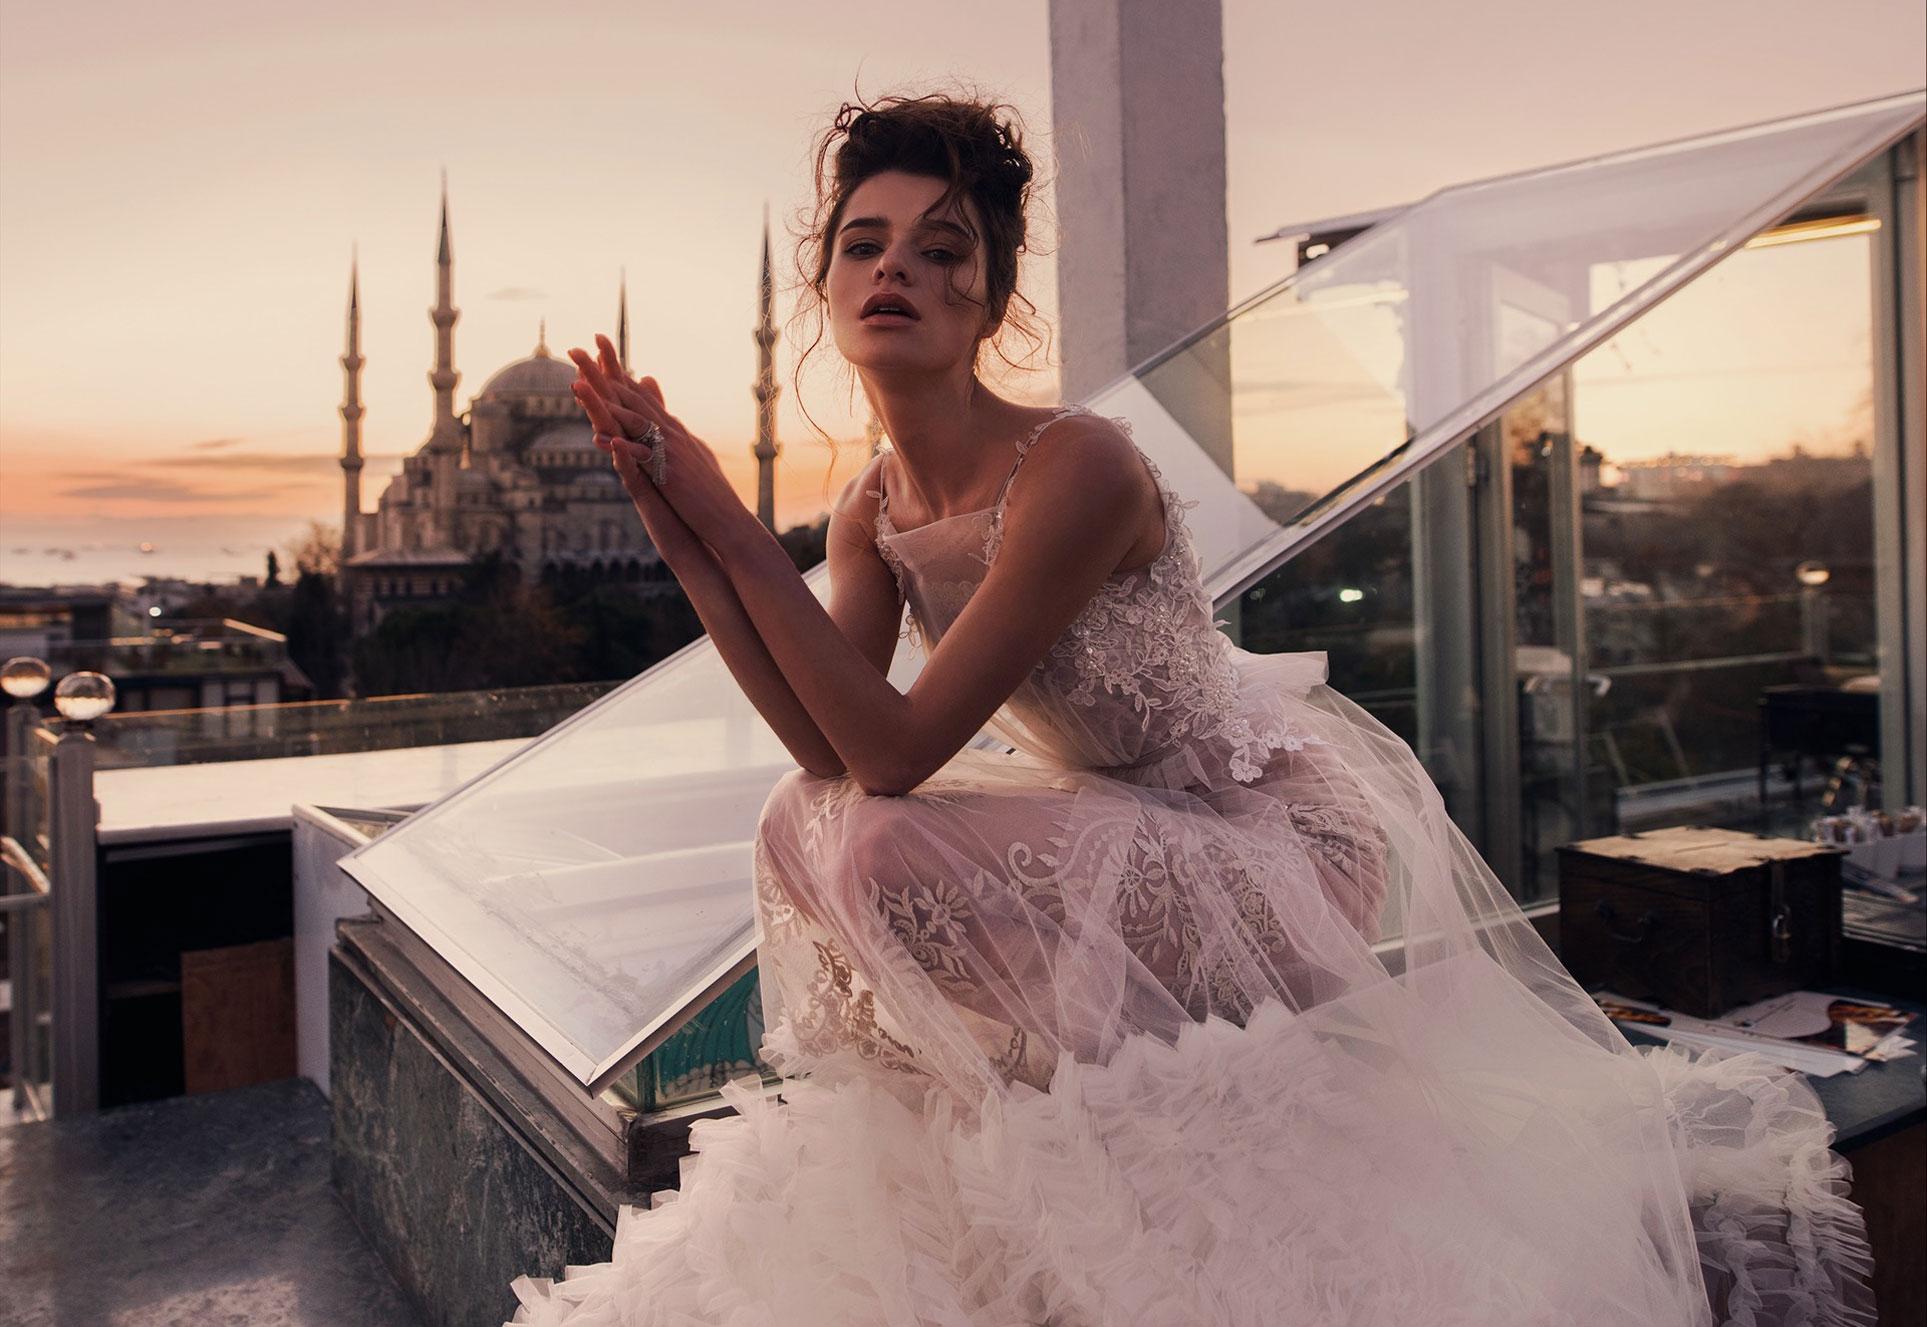 Прогулка в свадебном платье по Стамбулу / Anastasia Myrashka and Ece Bıcak by Alla Parhimovich